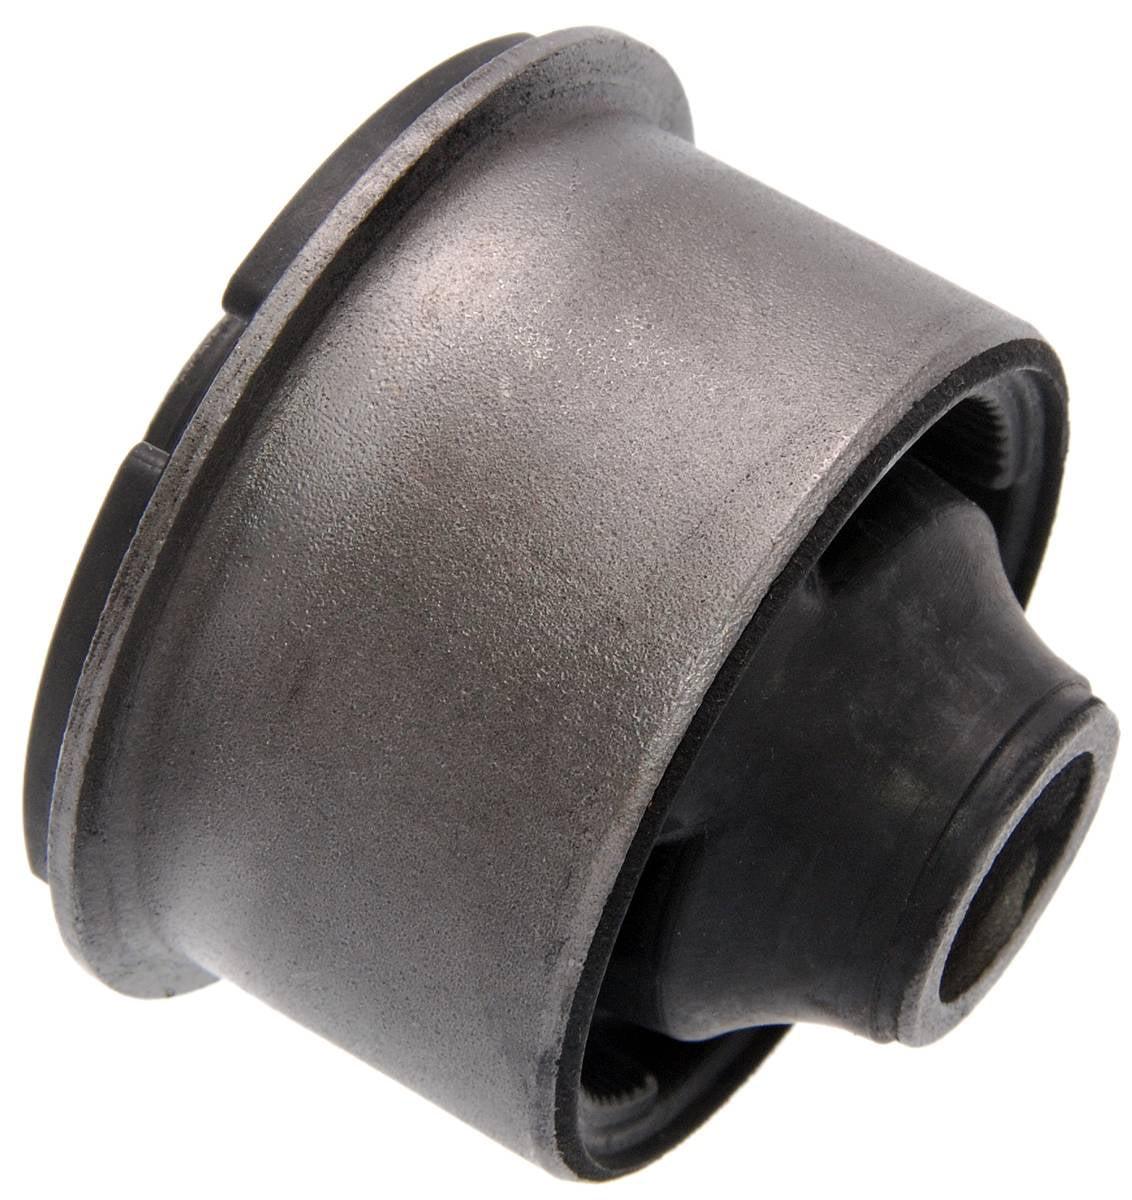 Febest TAB-187 ARM BUSHING FRONT LOWER ARM, LEXUS GS300/400/430 JZS160 1997-2005,  OEM 48655-30180